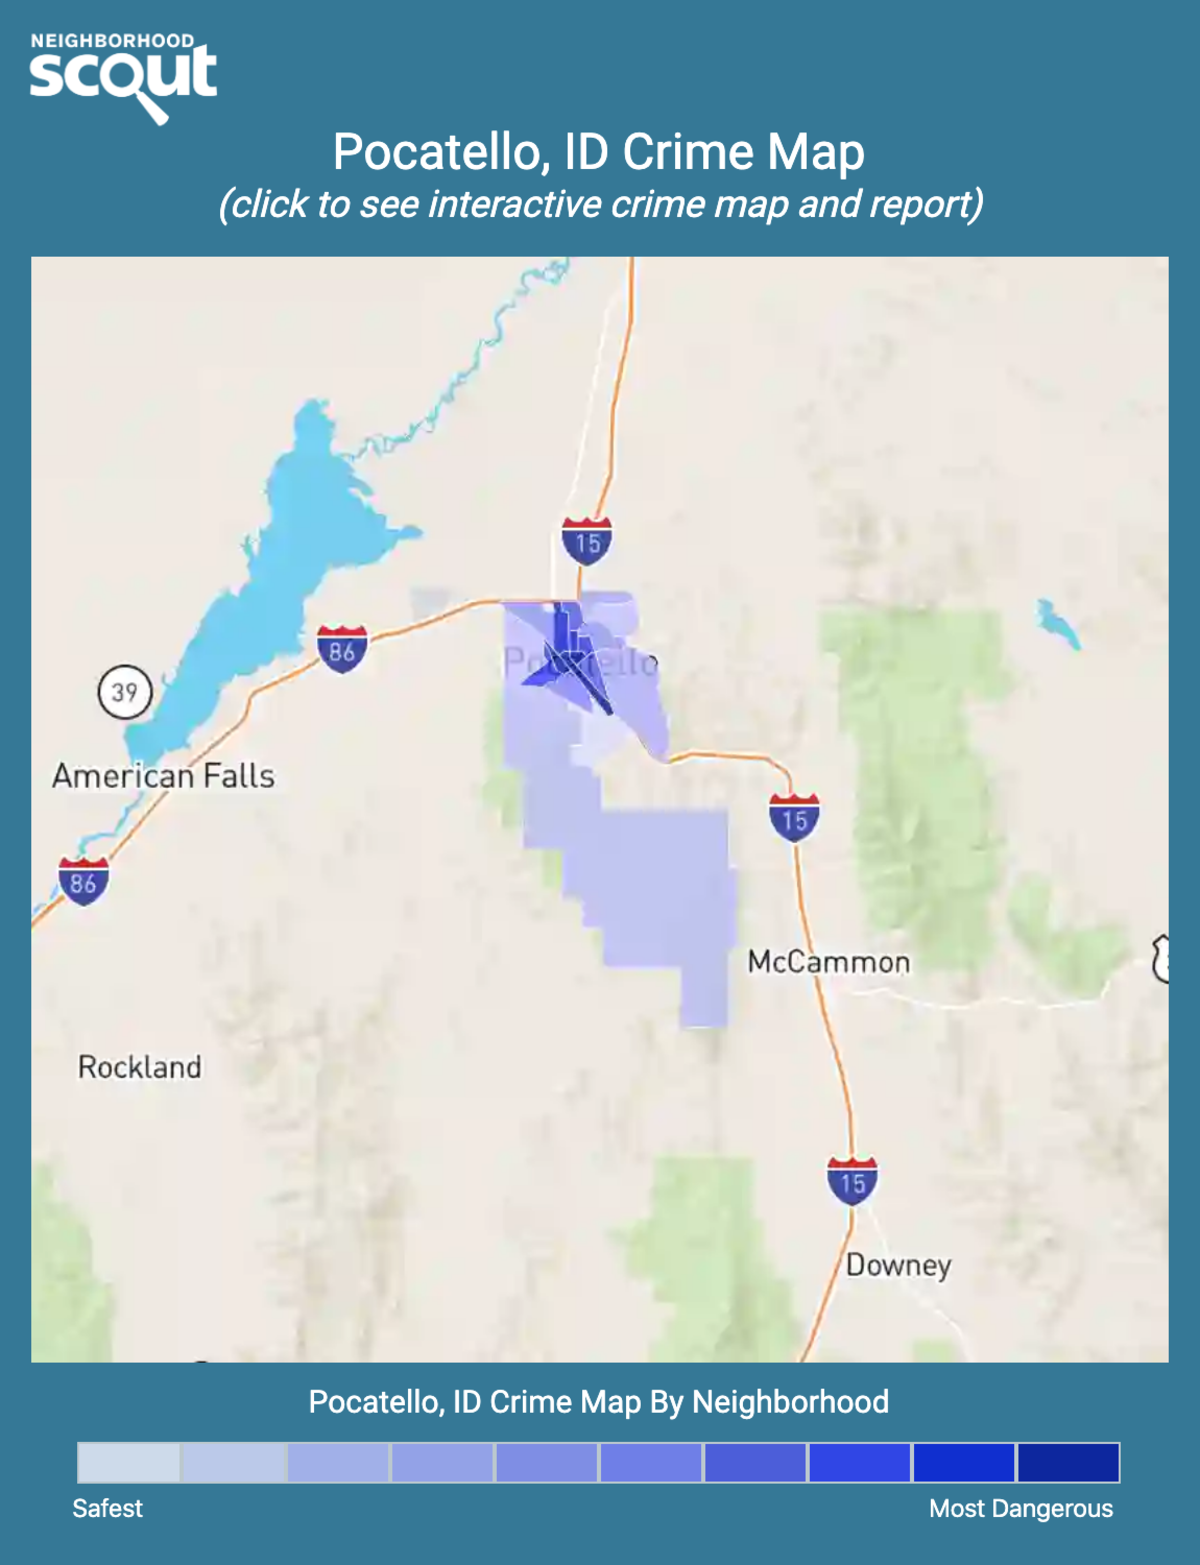 Pocatello, Idaho crime map